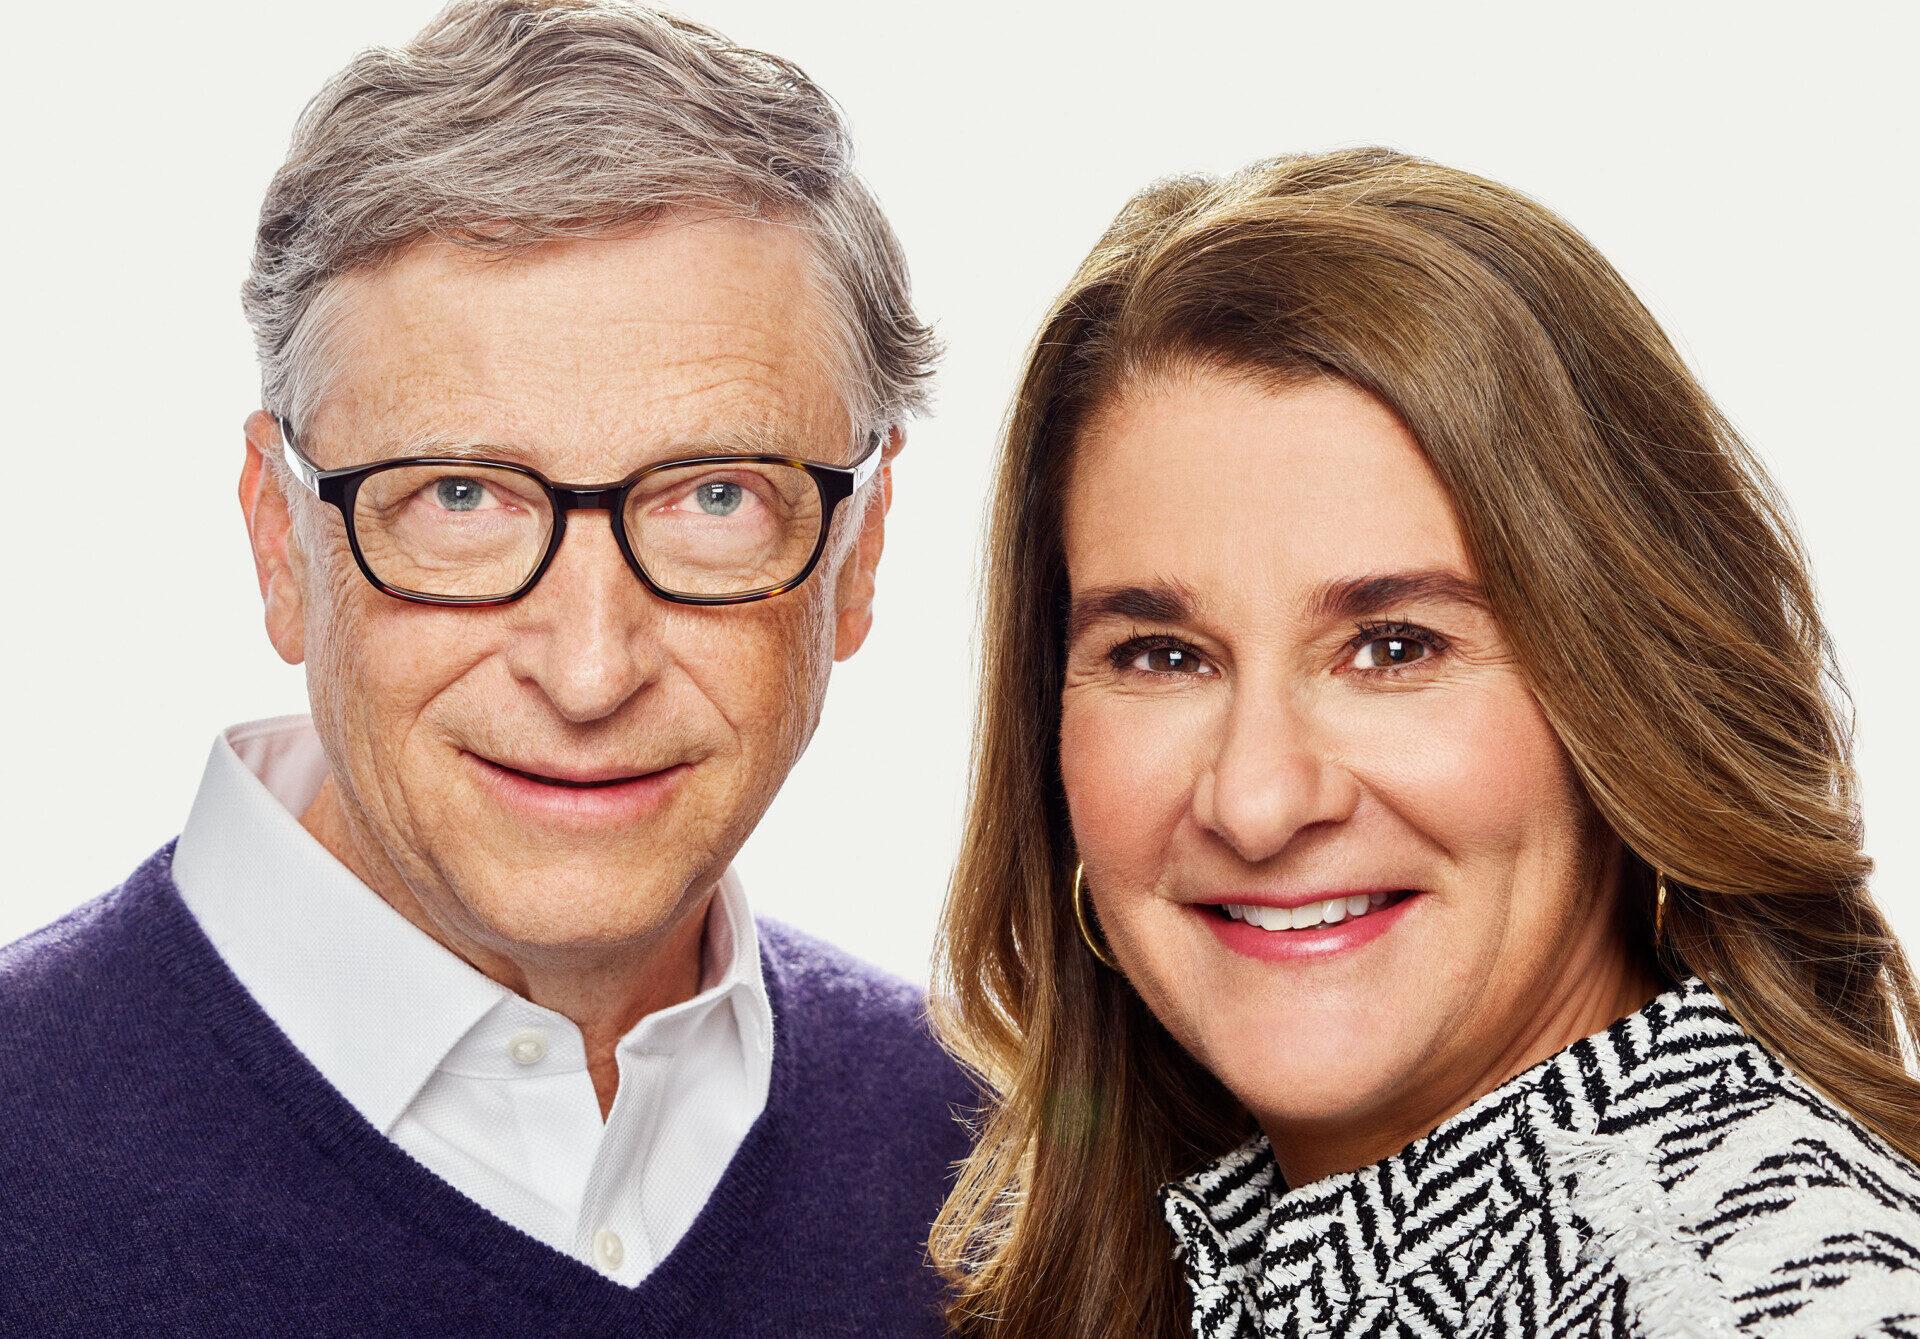 Bill Gates & Melinda Gates Split After 27 Years Of Marriage